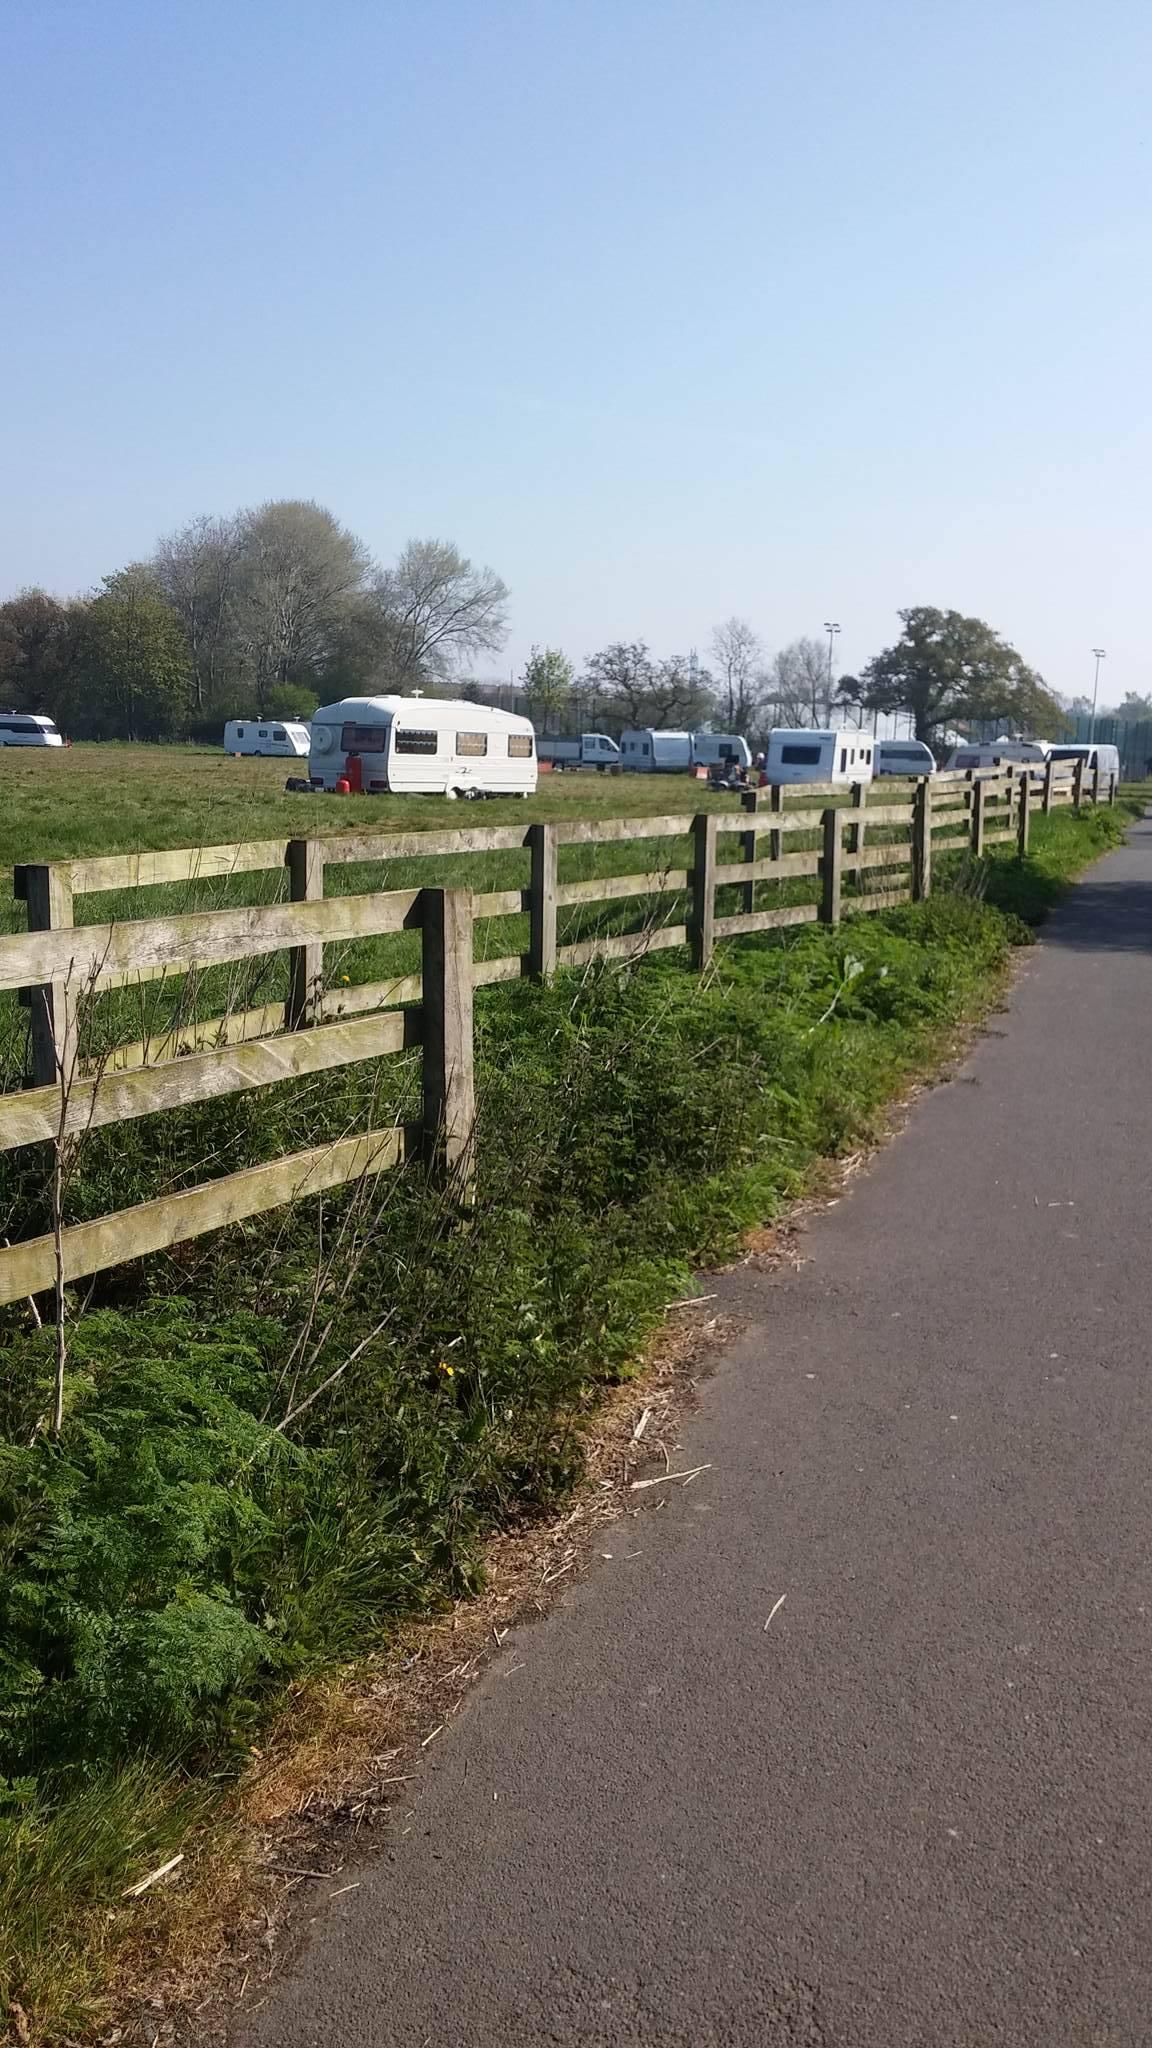 The caravans arrived at the end of April